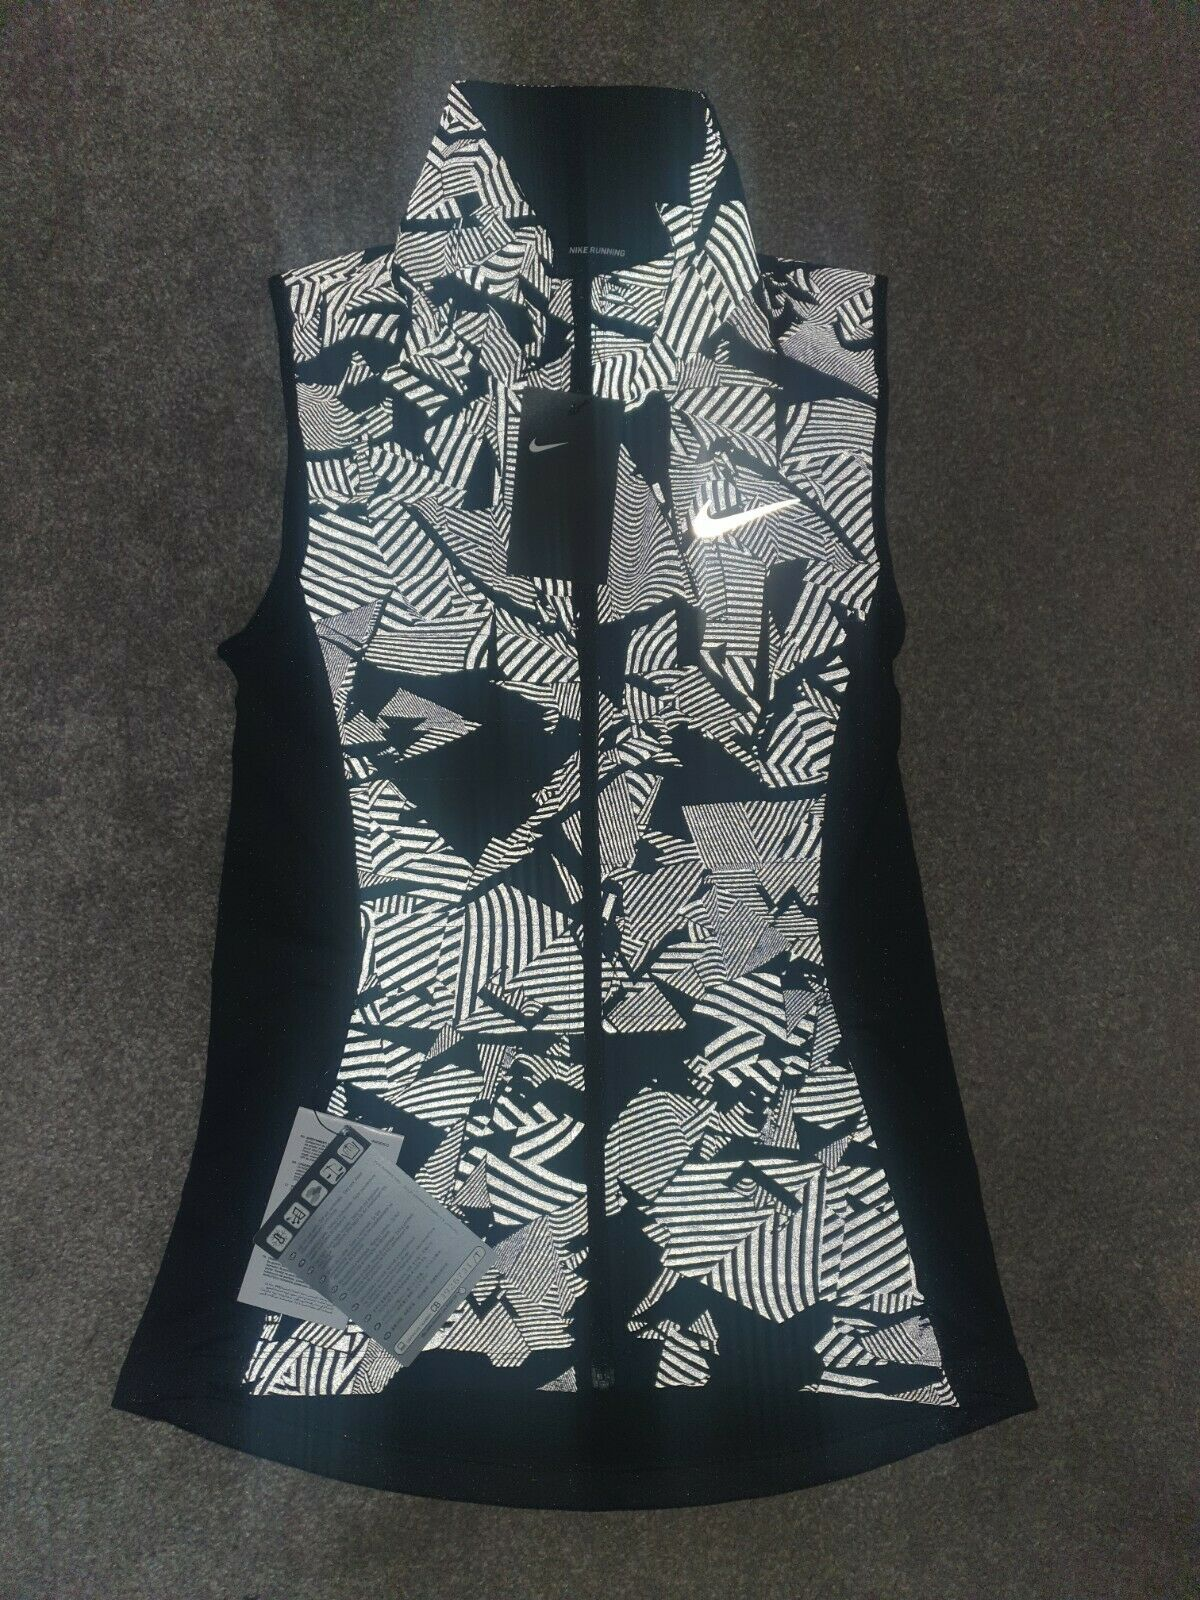 Nike Aeroloft Black/Silver Reflective Running Gilet Vest Women's XS Extra Small